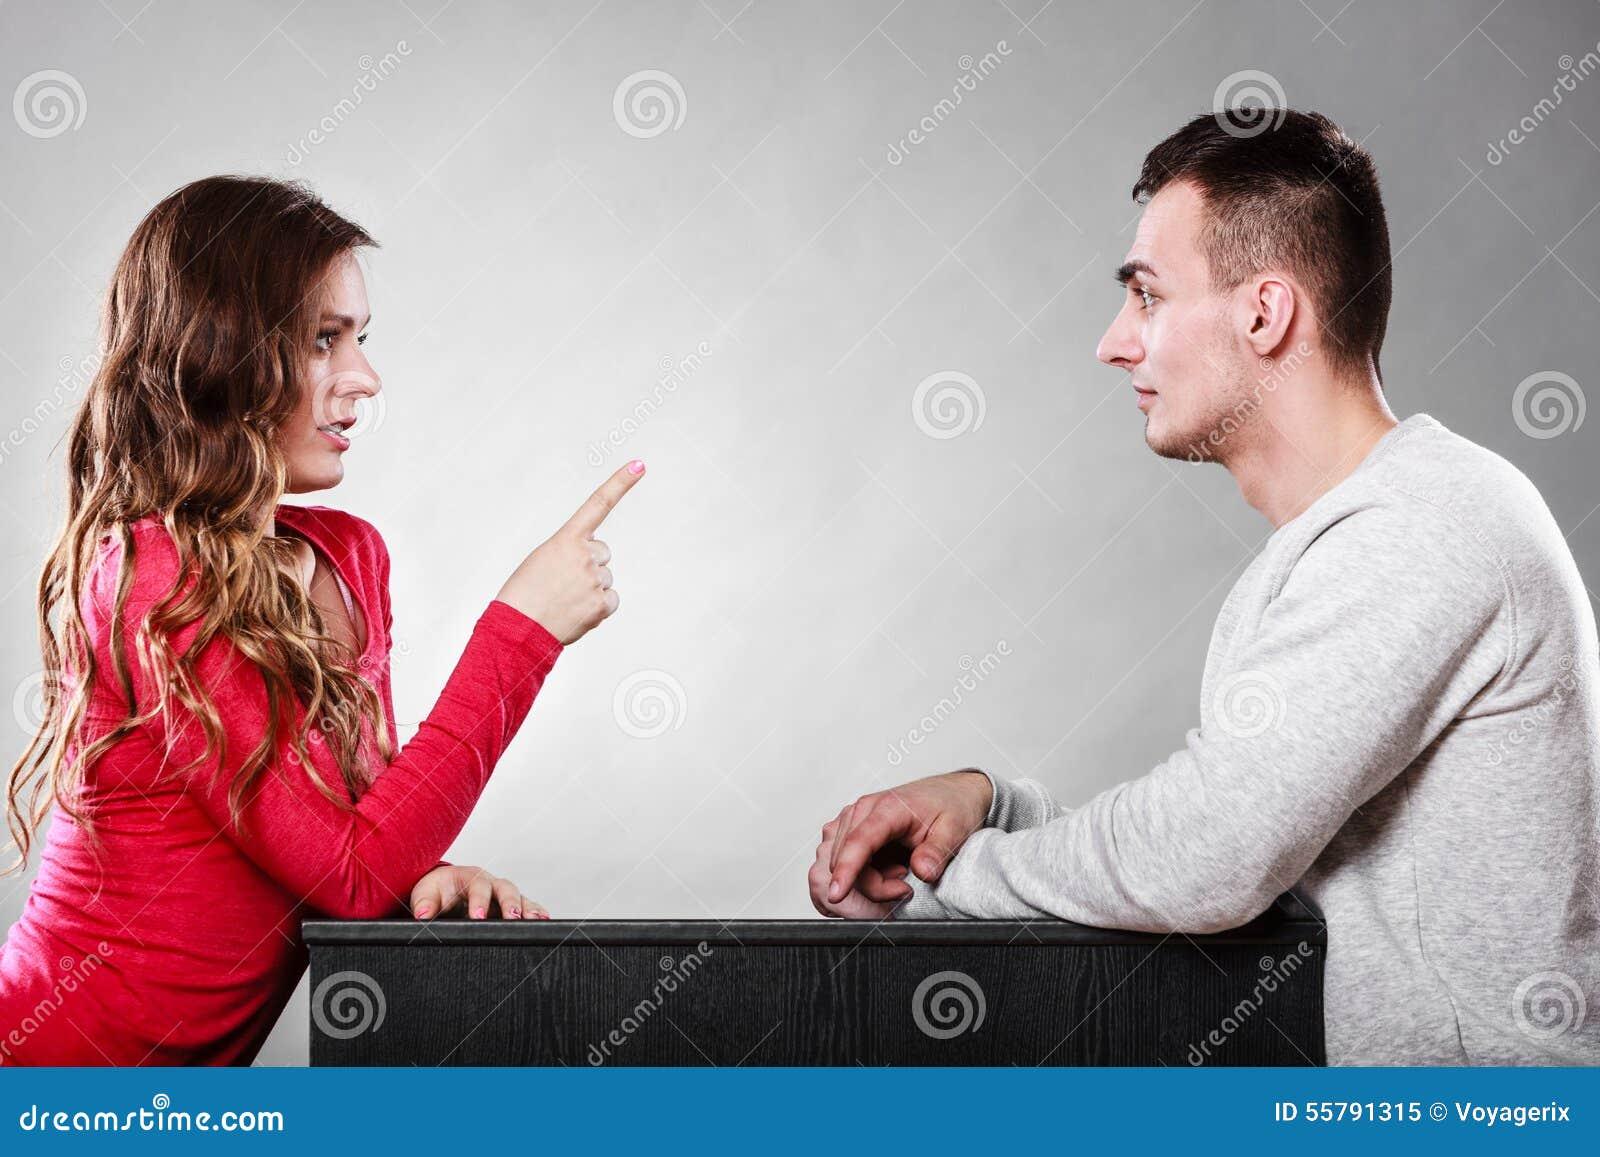 Woman warning man. Girl threatening with finger.